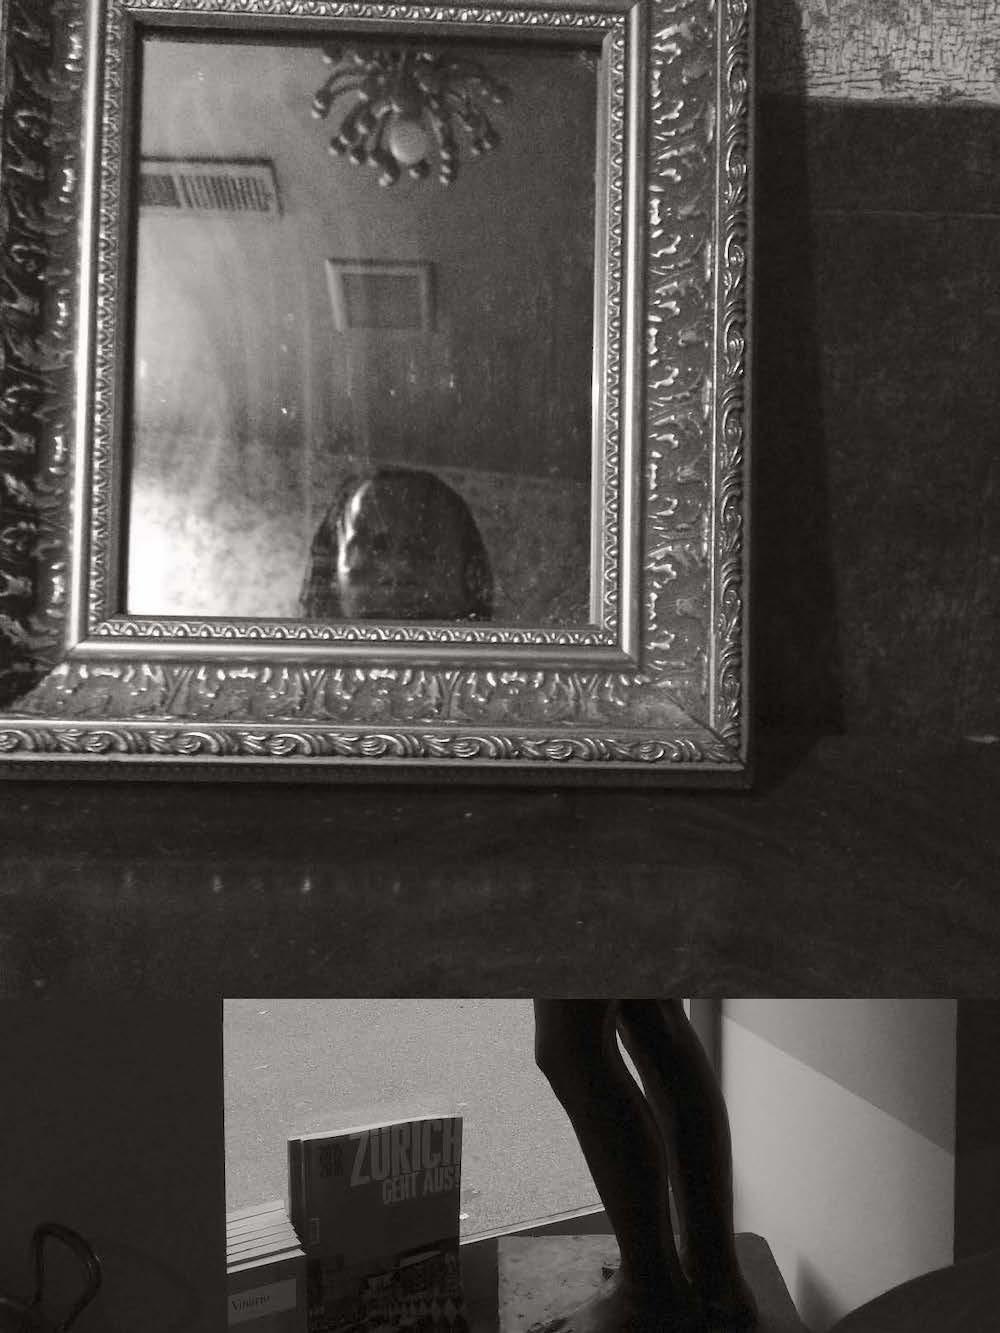 Deborah Willis, Self Portrait in Mirror, Harlem Restaurant, 2015. Courtesy: the artist 22